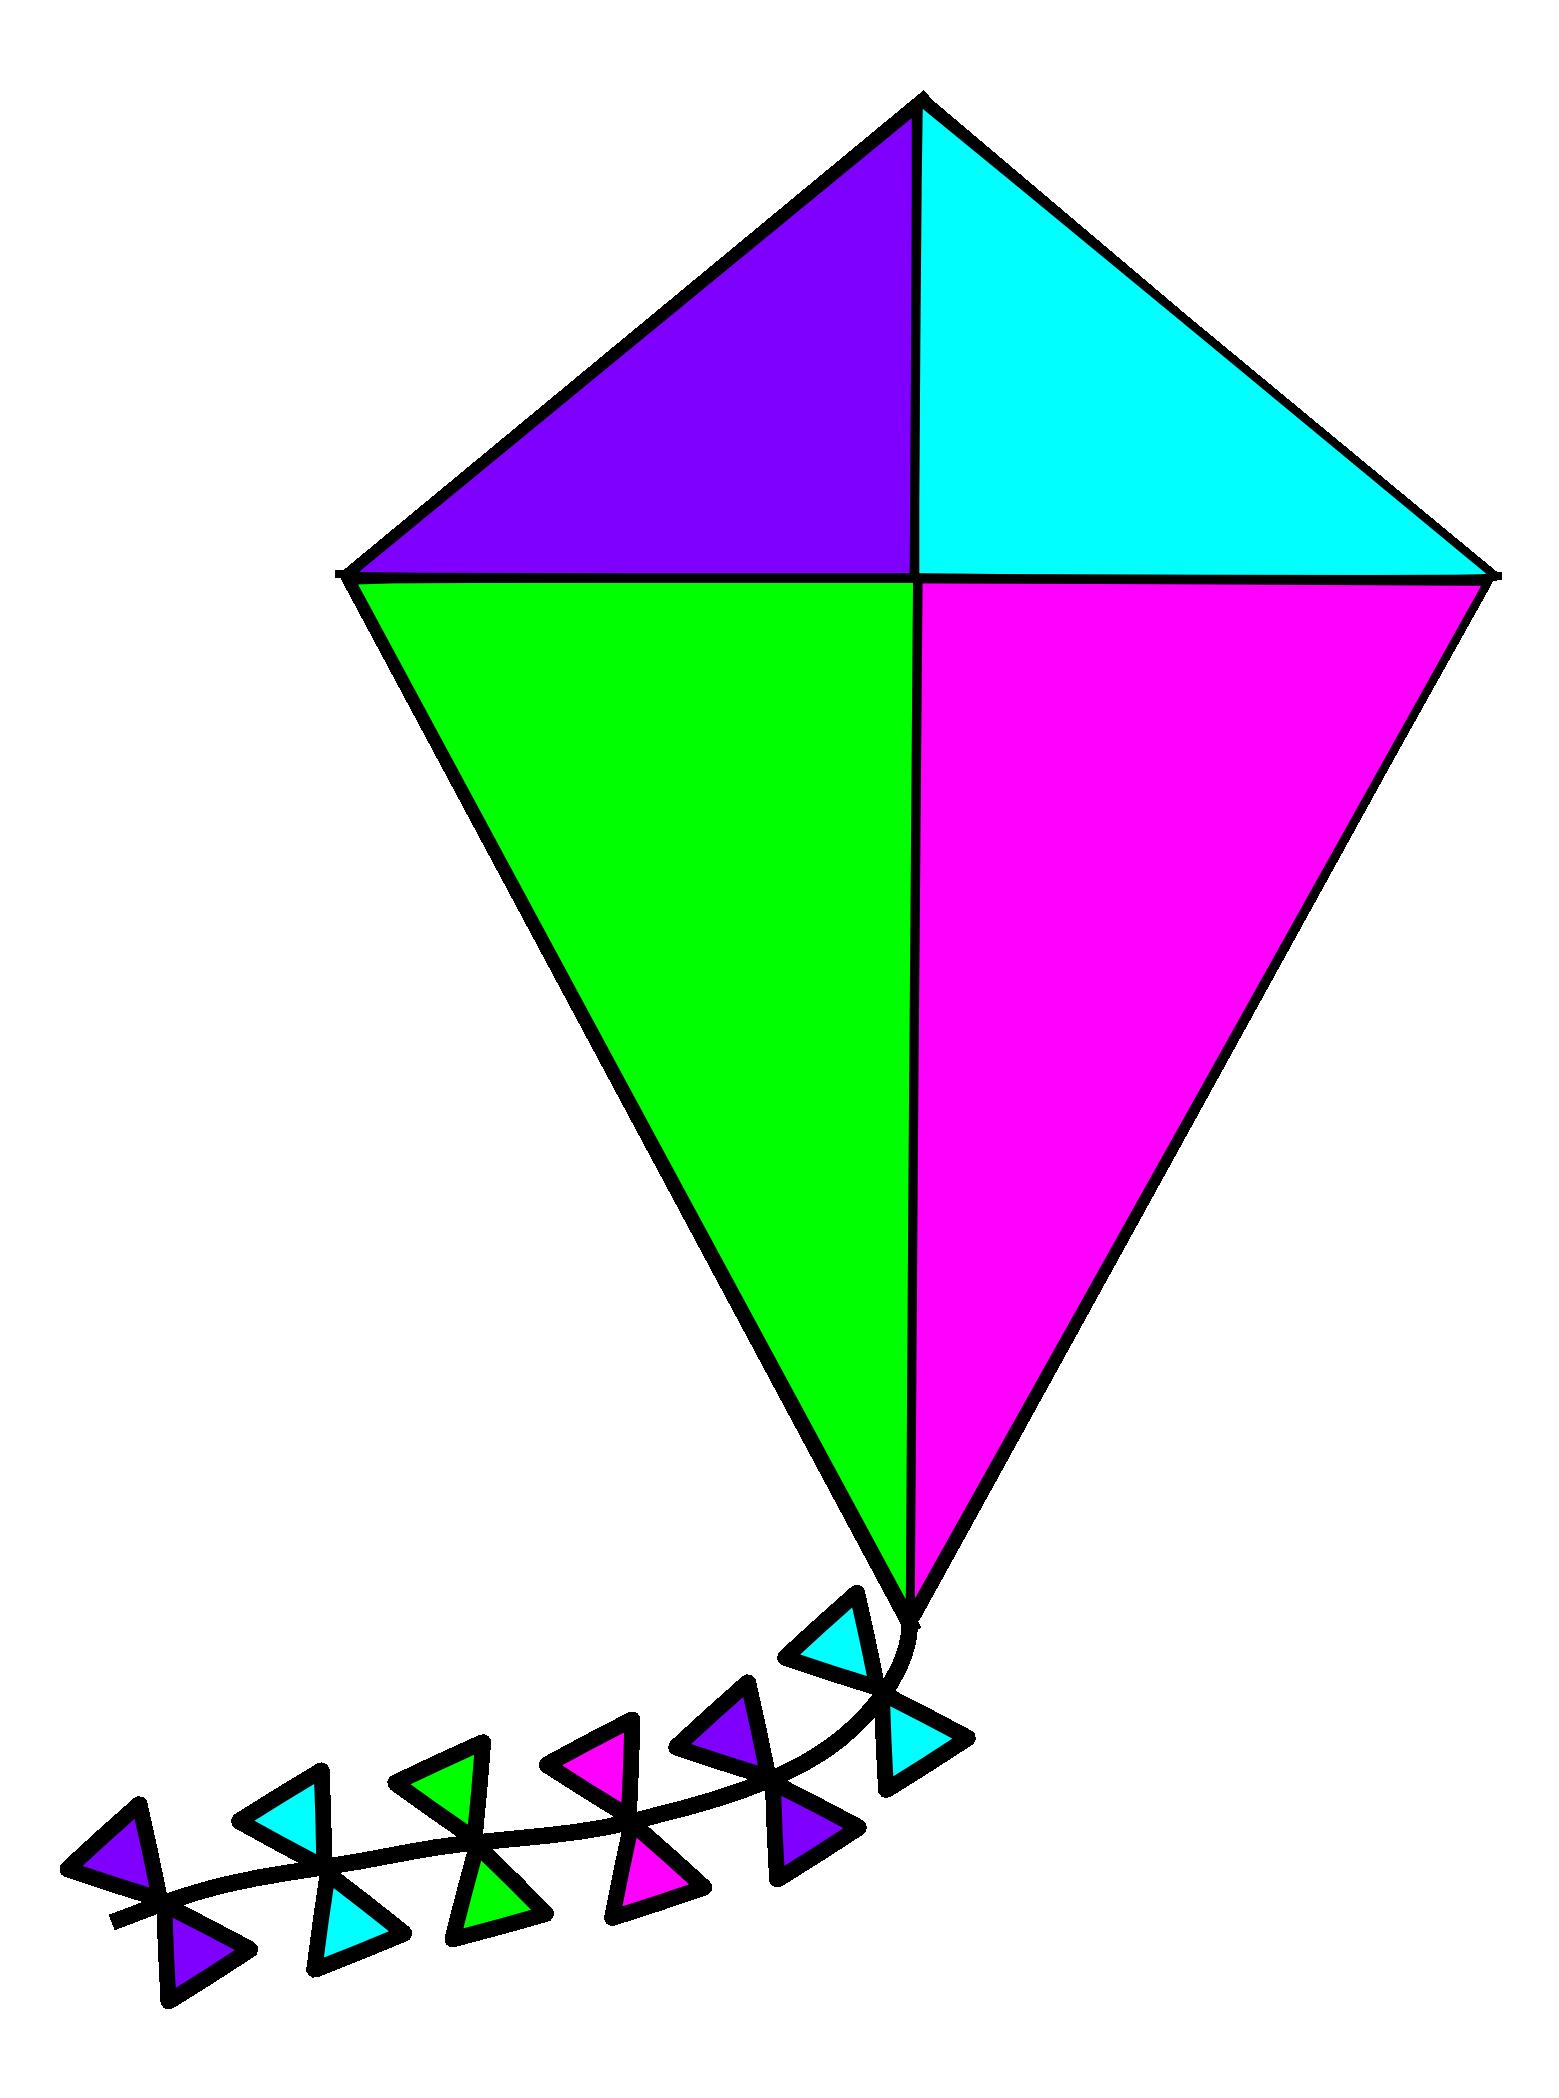 Kite clipart kite thread. Png transparent image pngpix